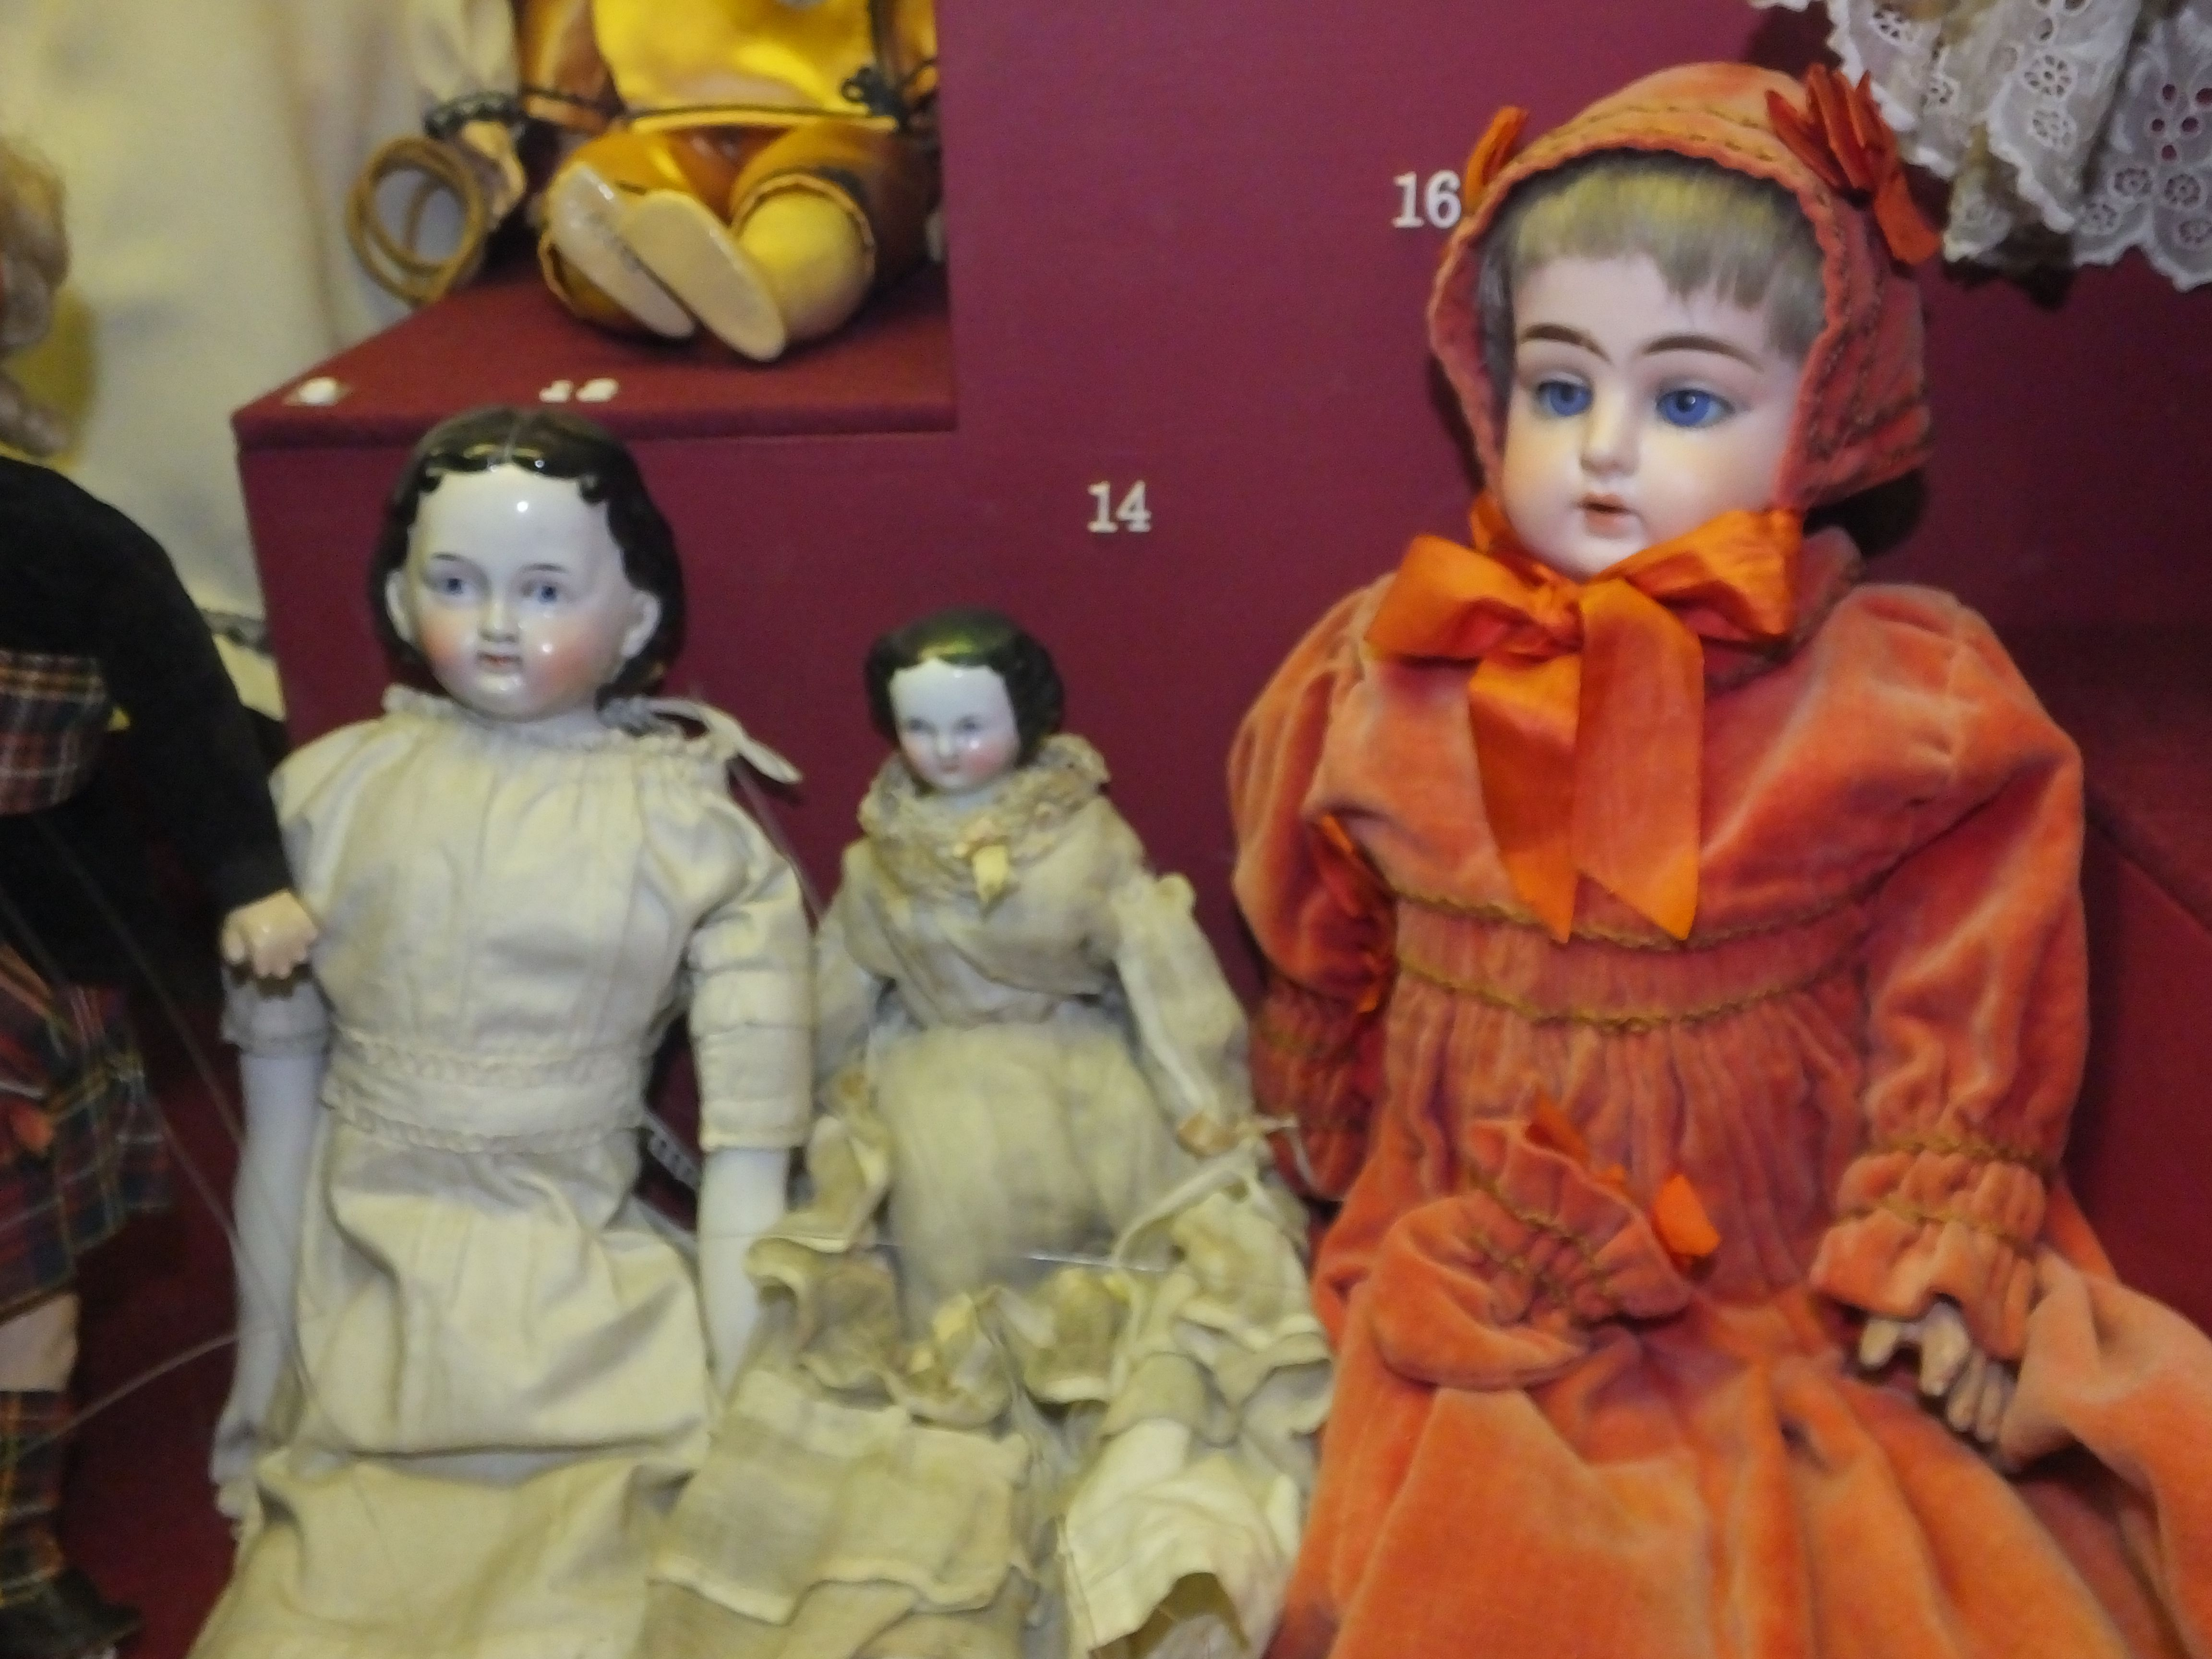 Heubach dolls